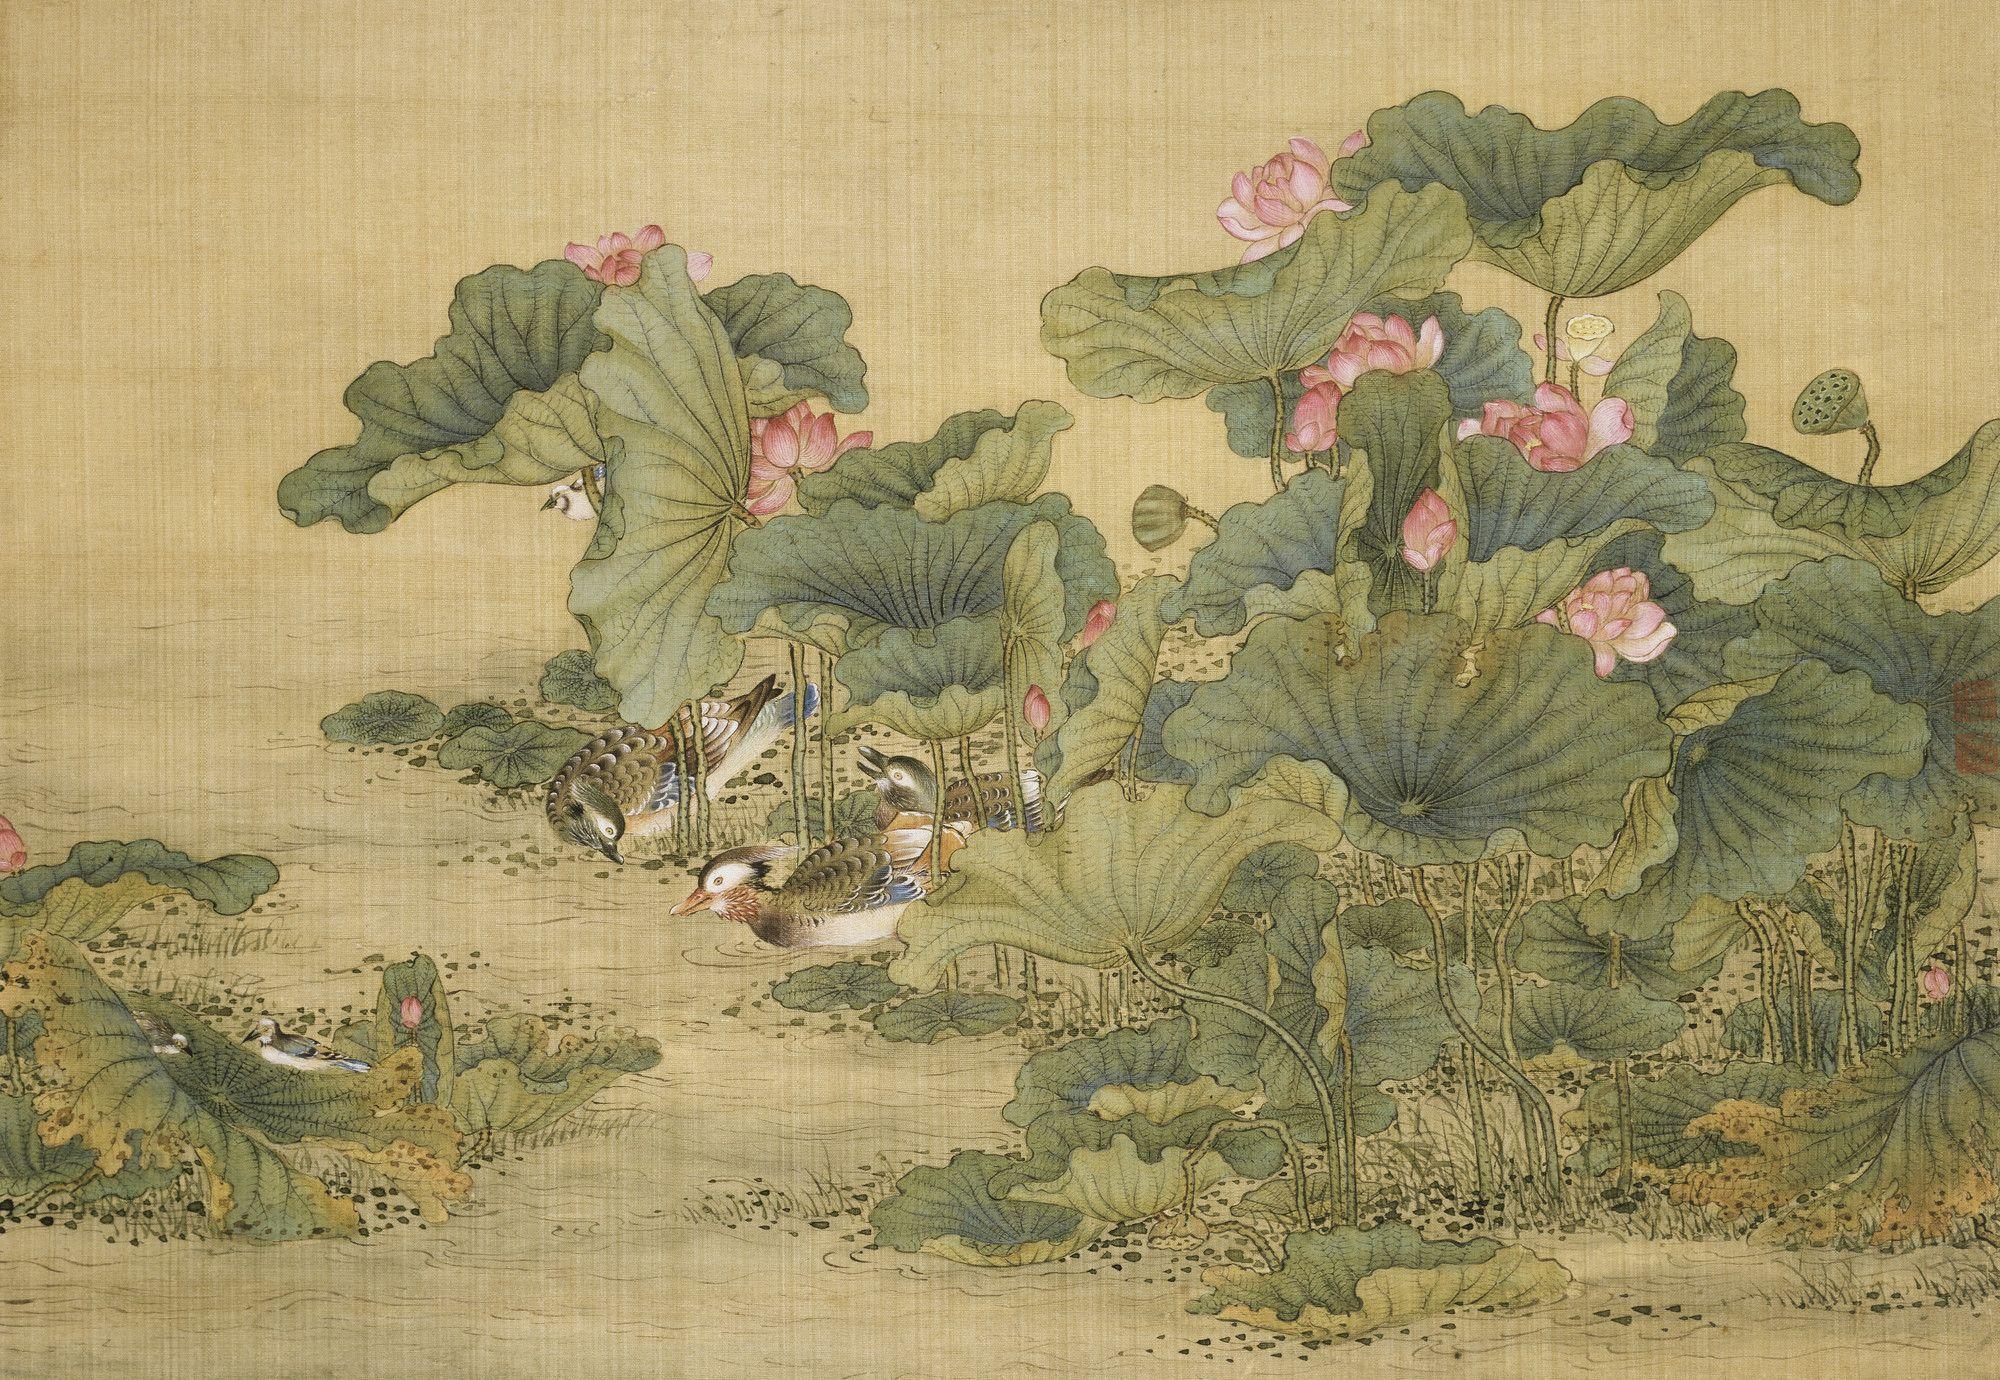 Album Of Birds And Animals Mandarin Ducks And Lotus Flowers